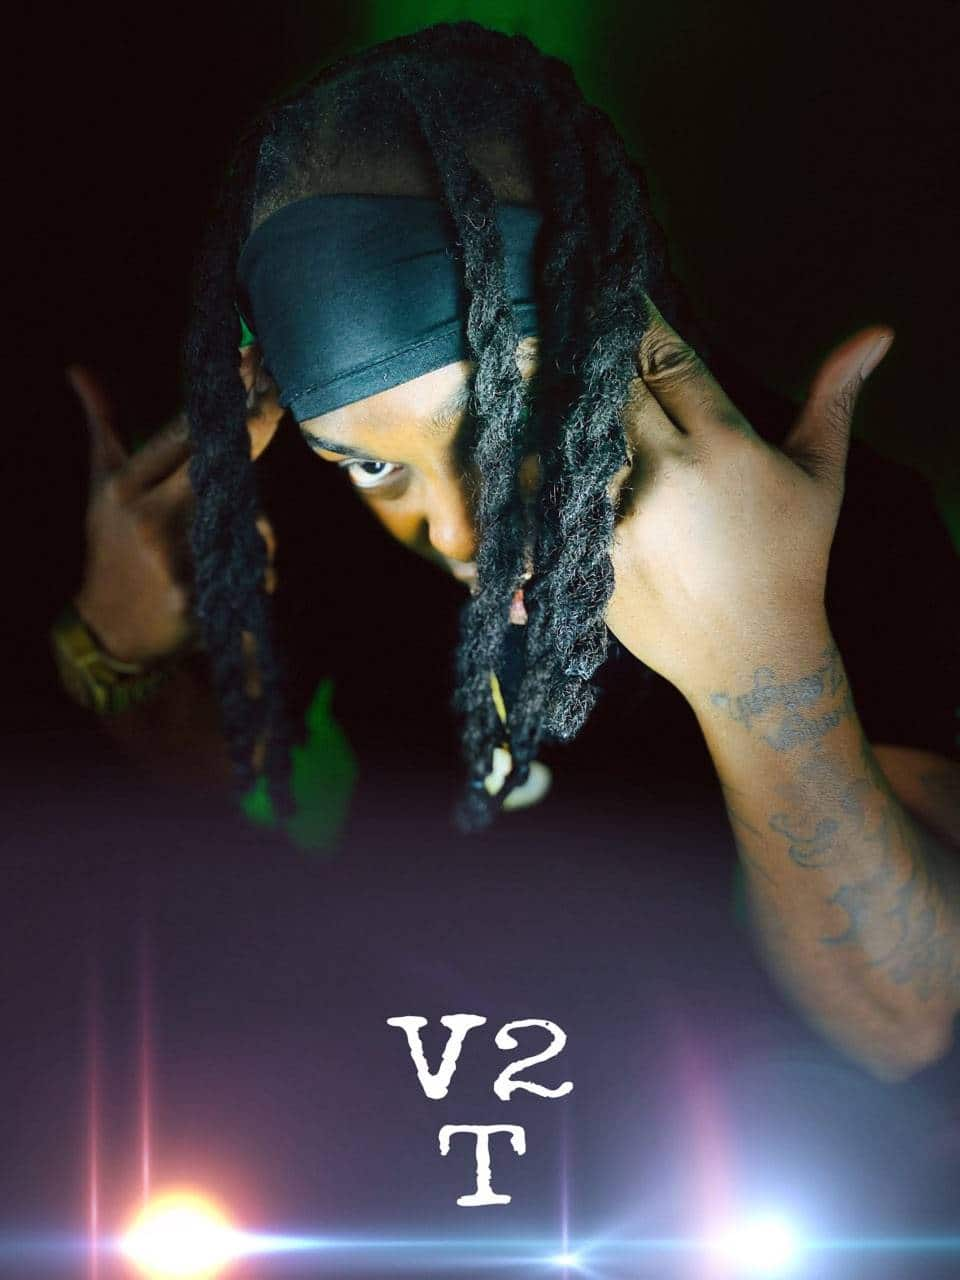 rapper Visionz2turnt